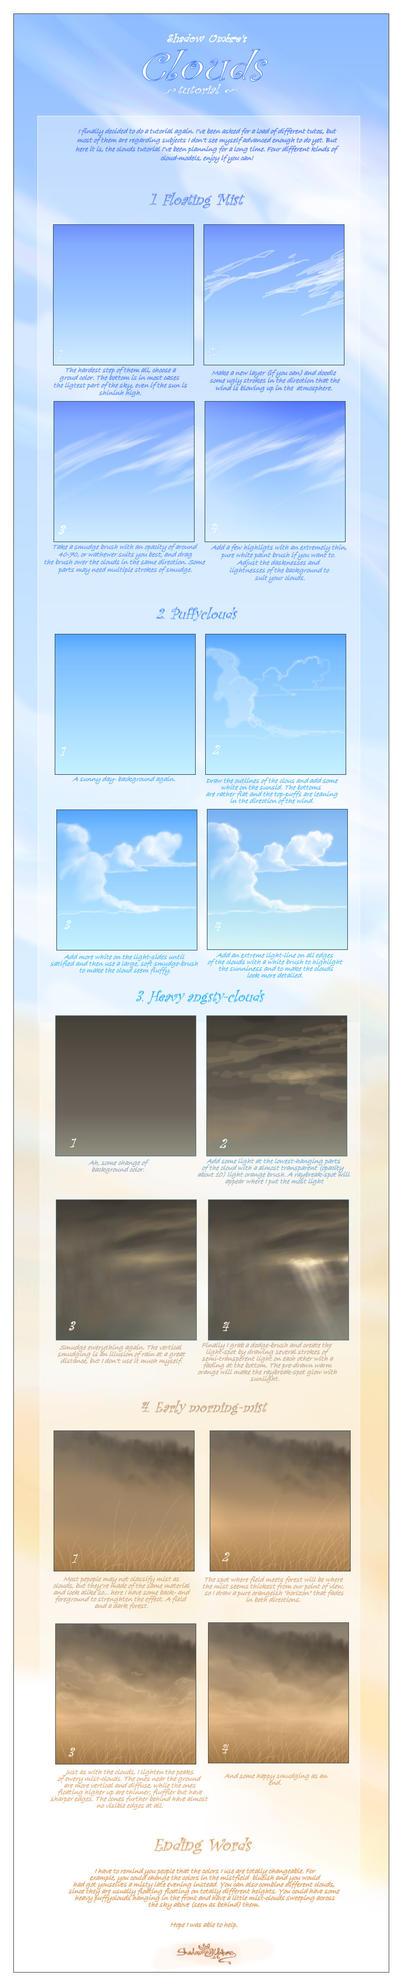 Clouds tutorial by MinnaSundberg